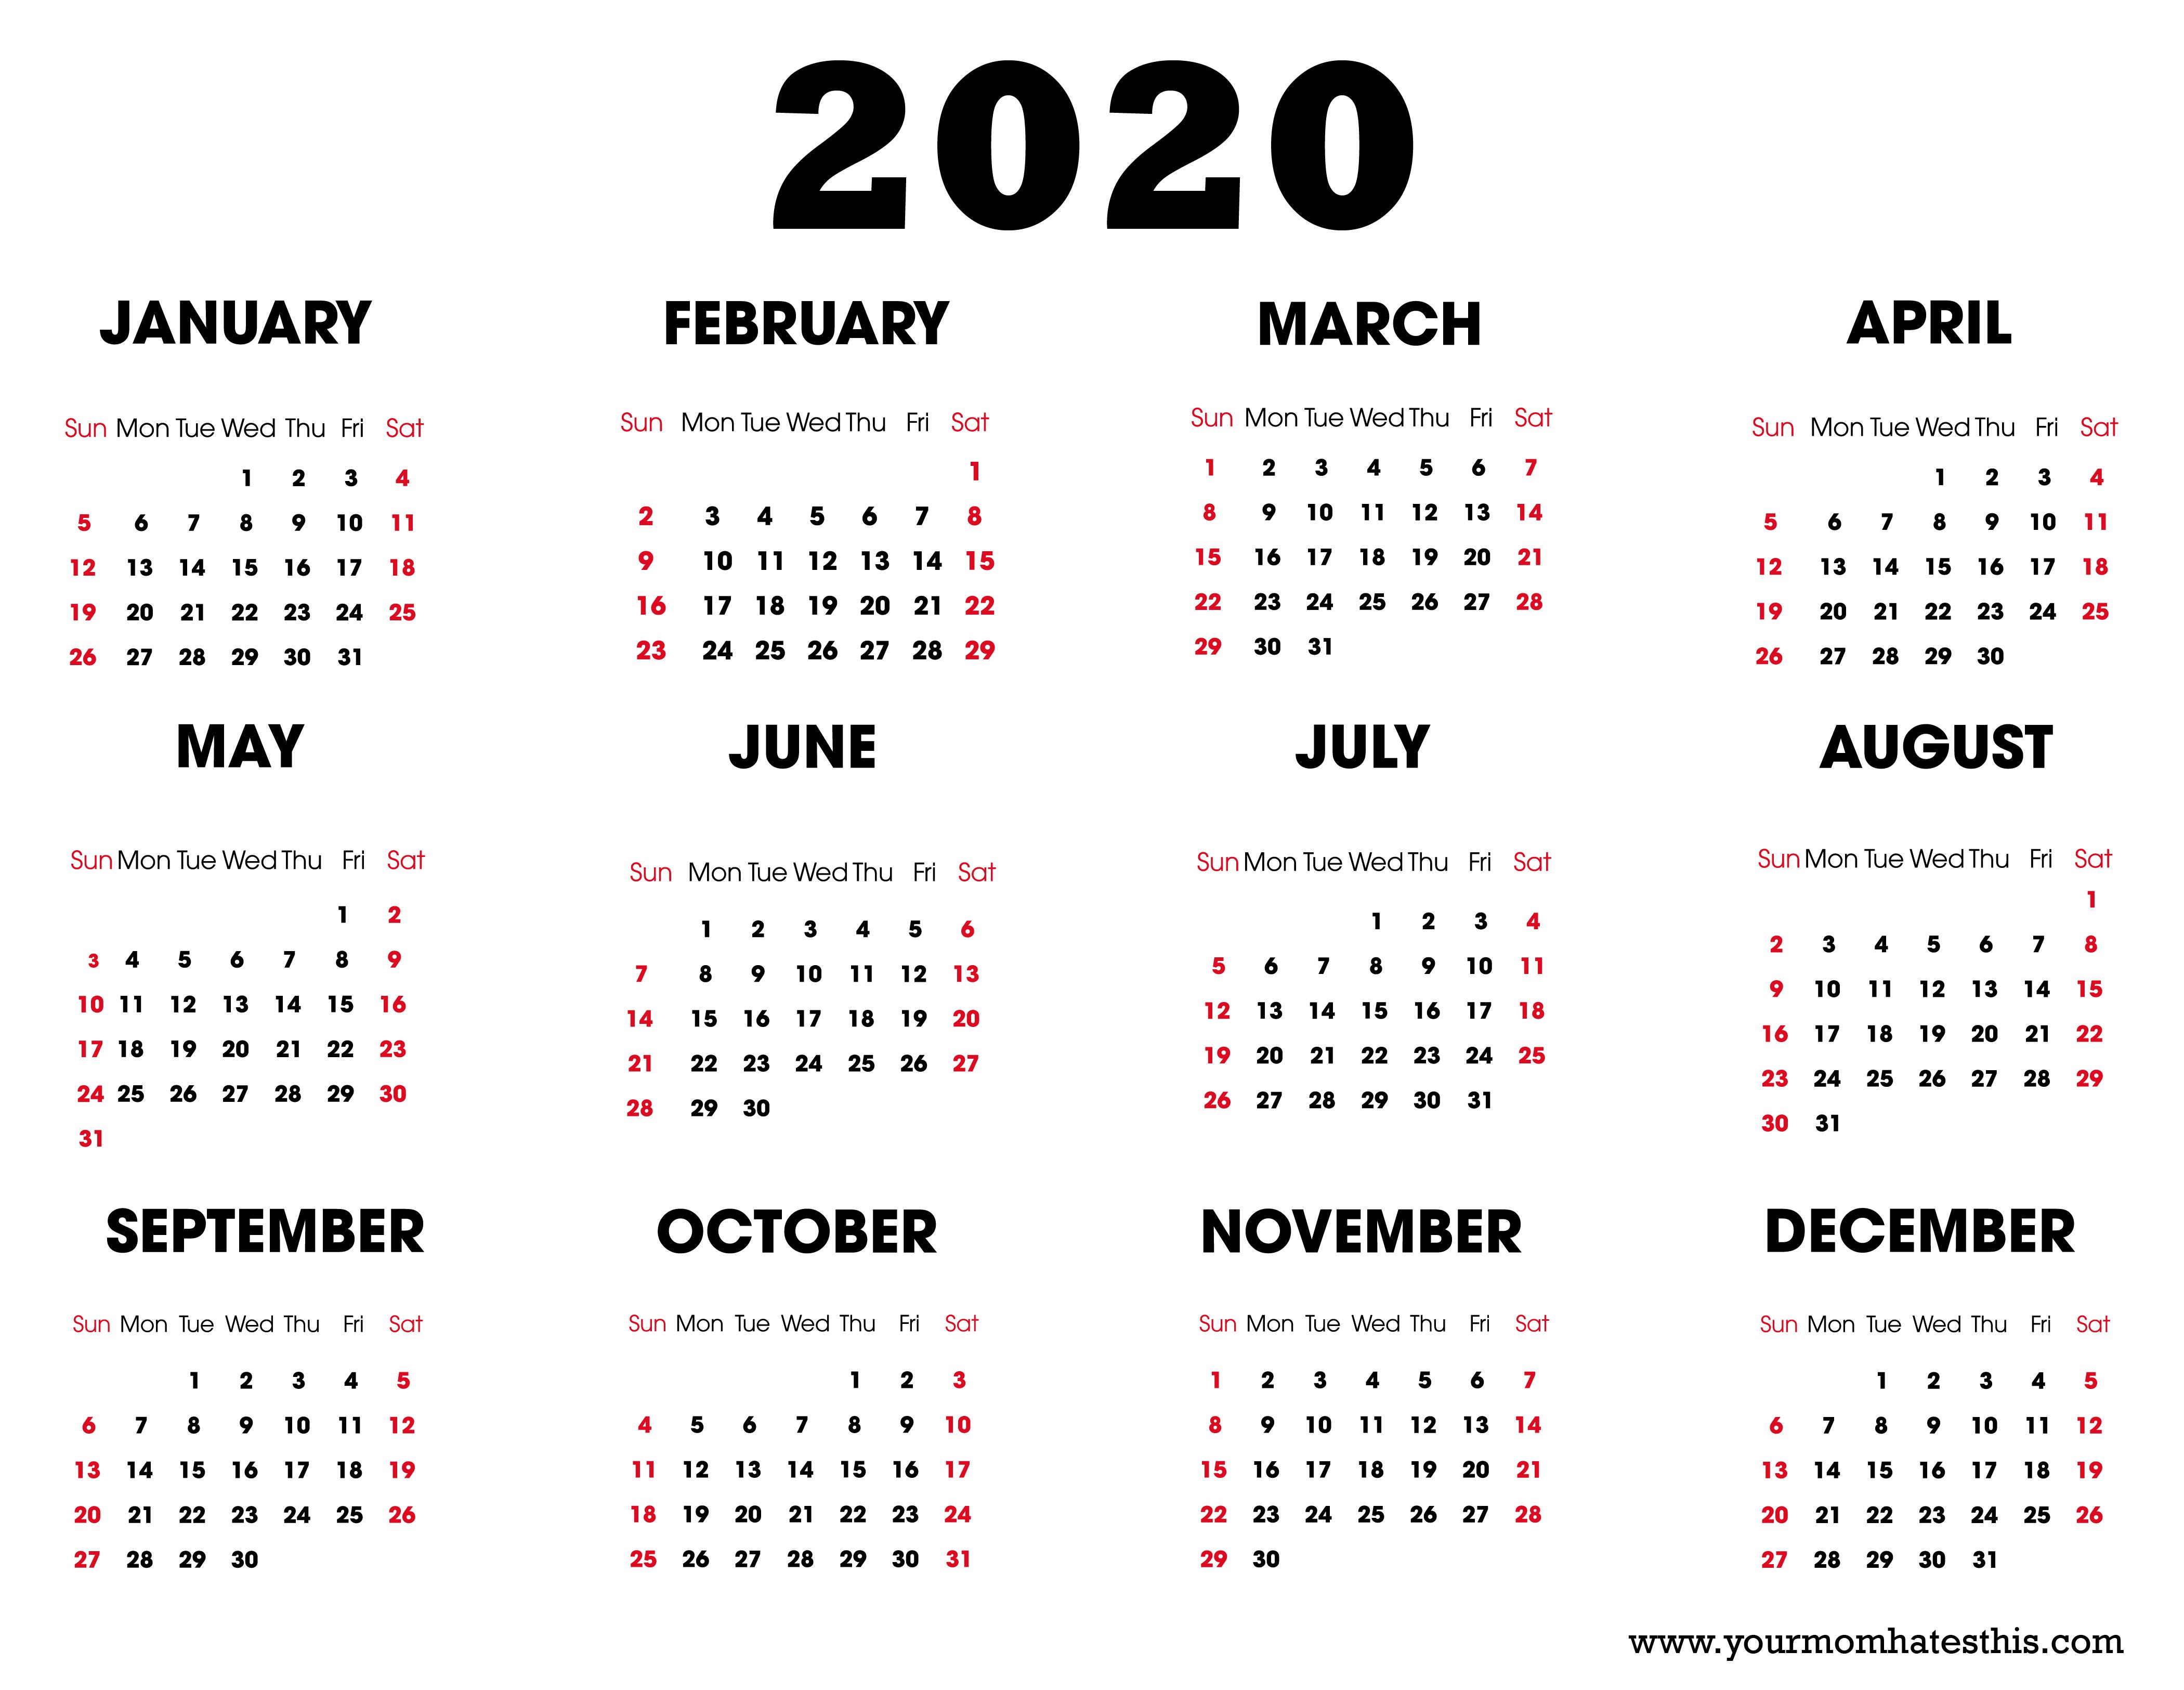 2020 Calendar – Download Printable Calendars regarding Free Calendar 2020 Dont Have To Download